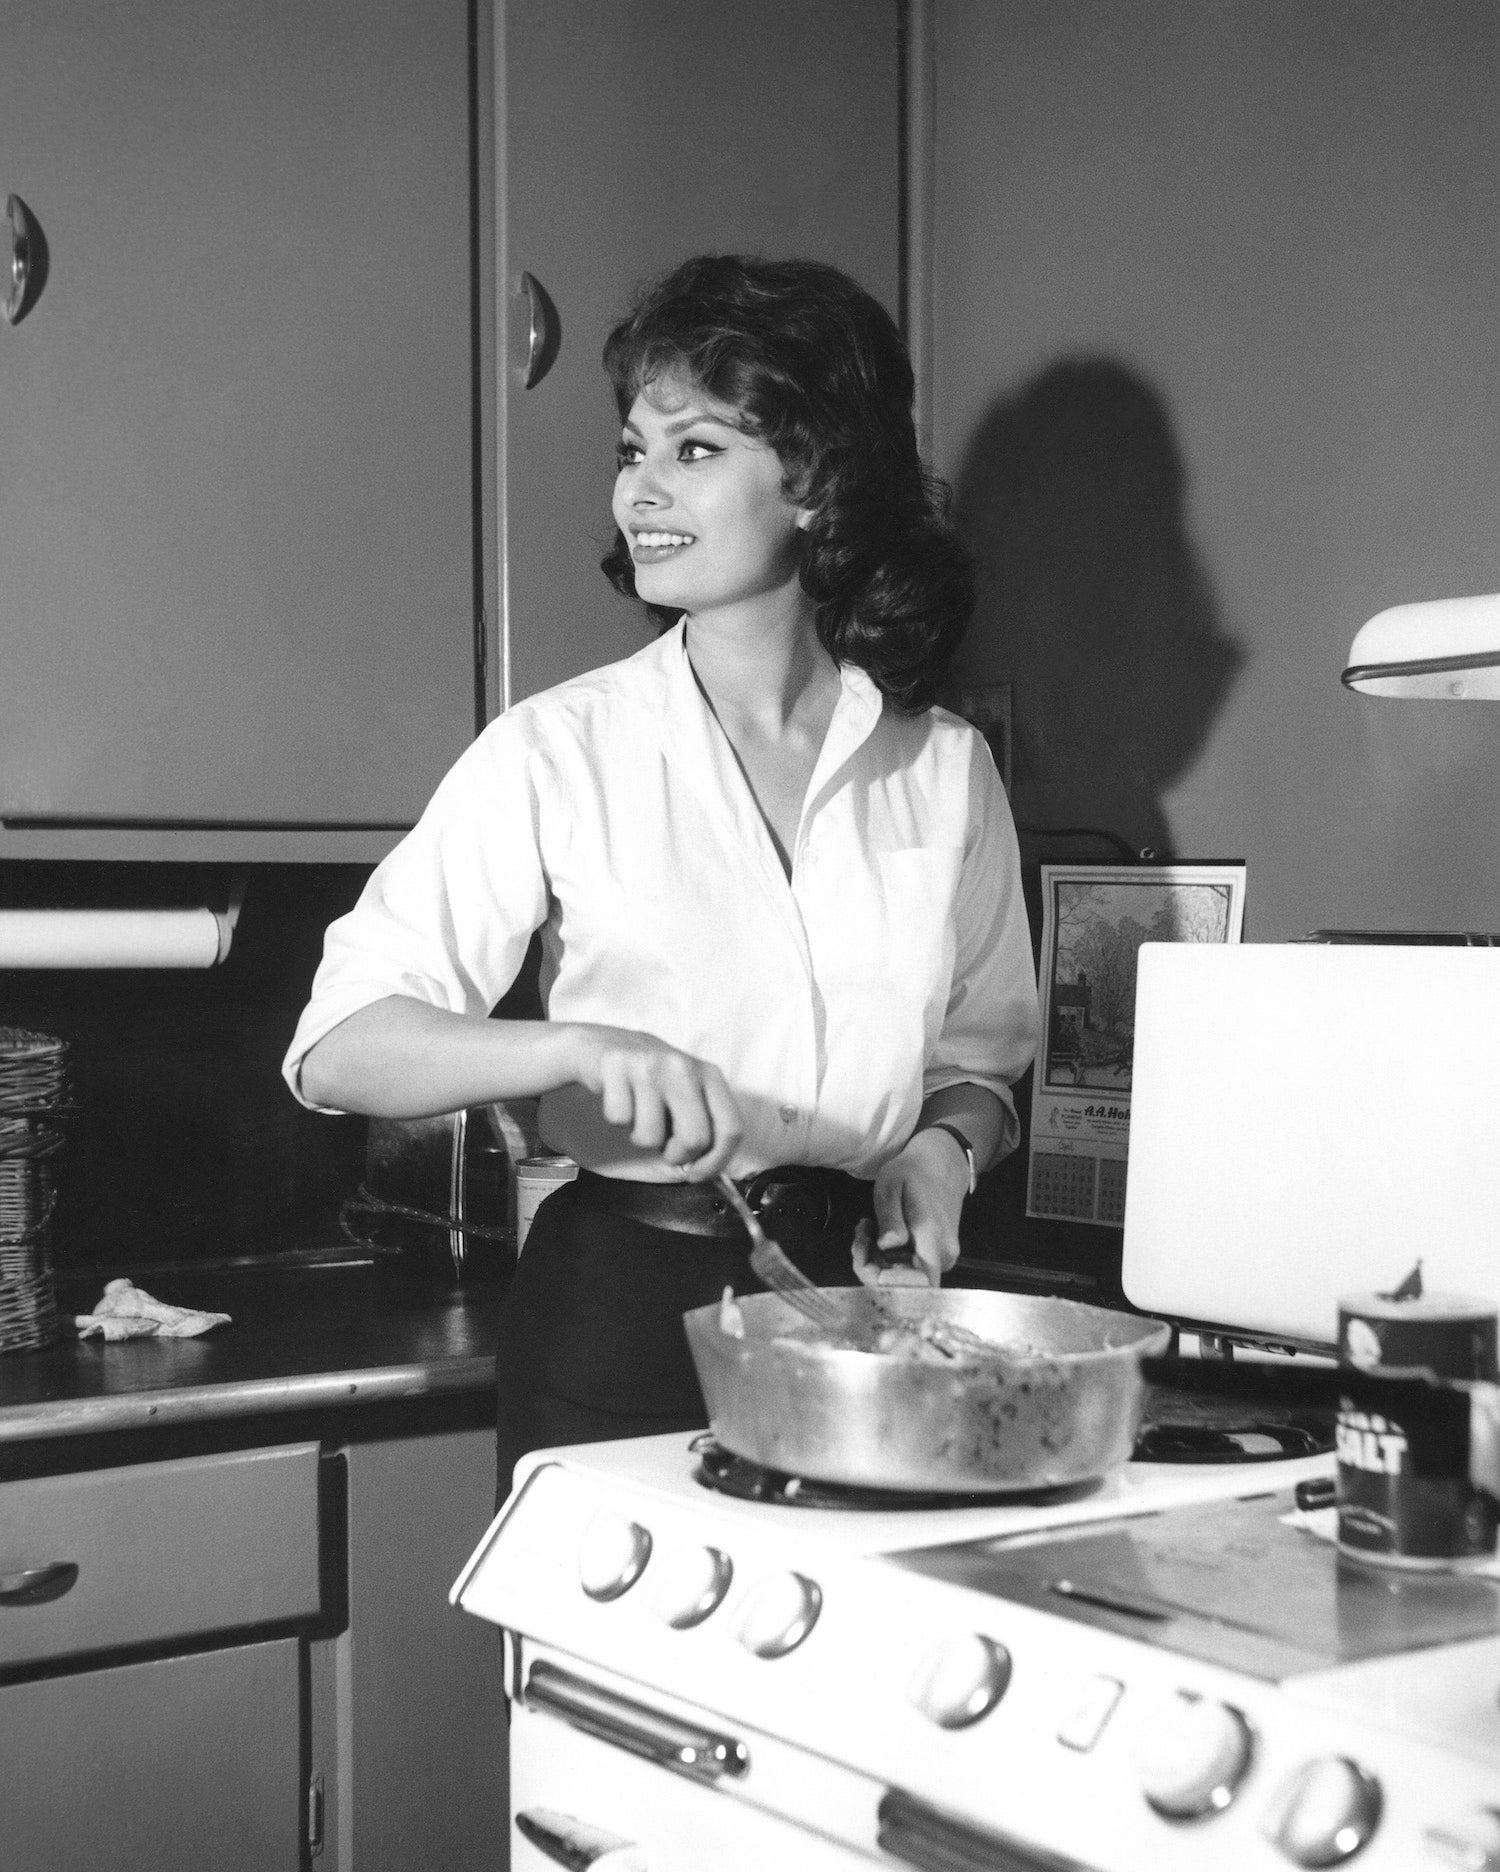 Sophia Loren v kuchyni svého římského bytu, 1960        Autor: API/Gamma-Rapho via Getty Images